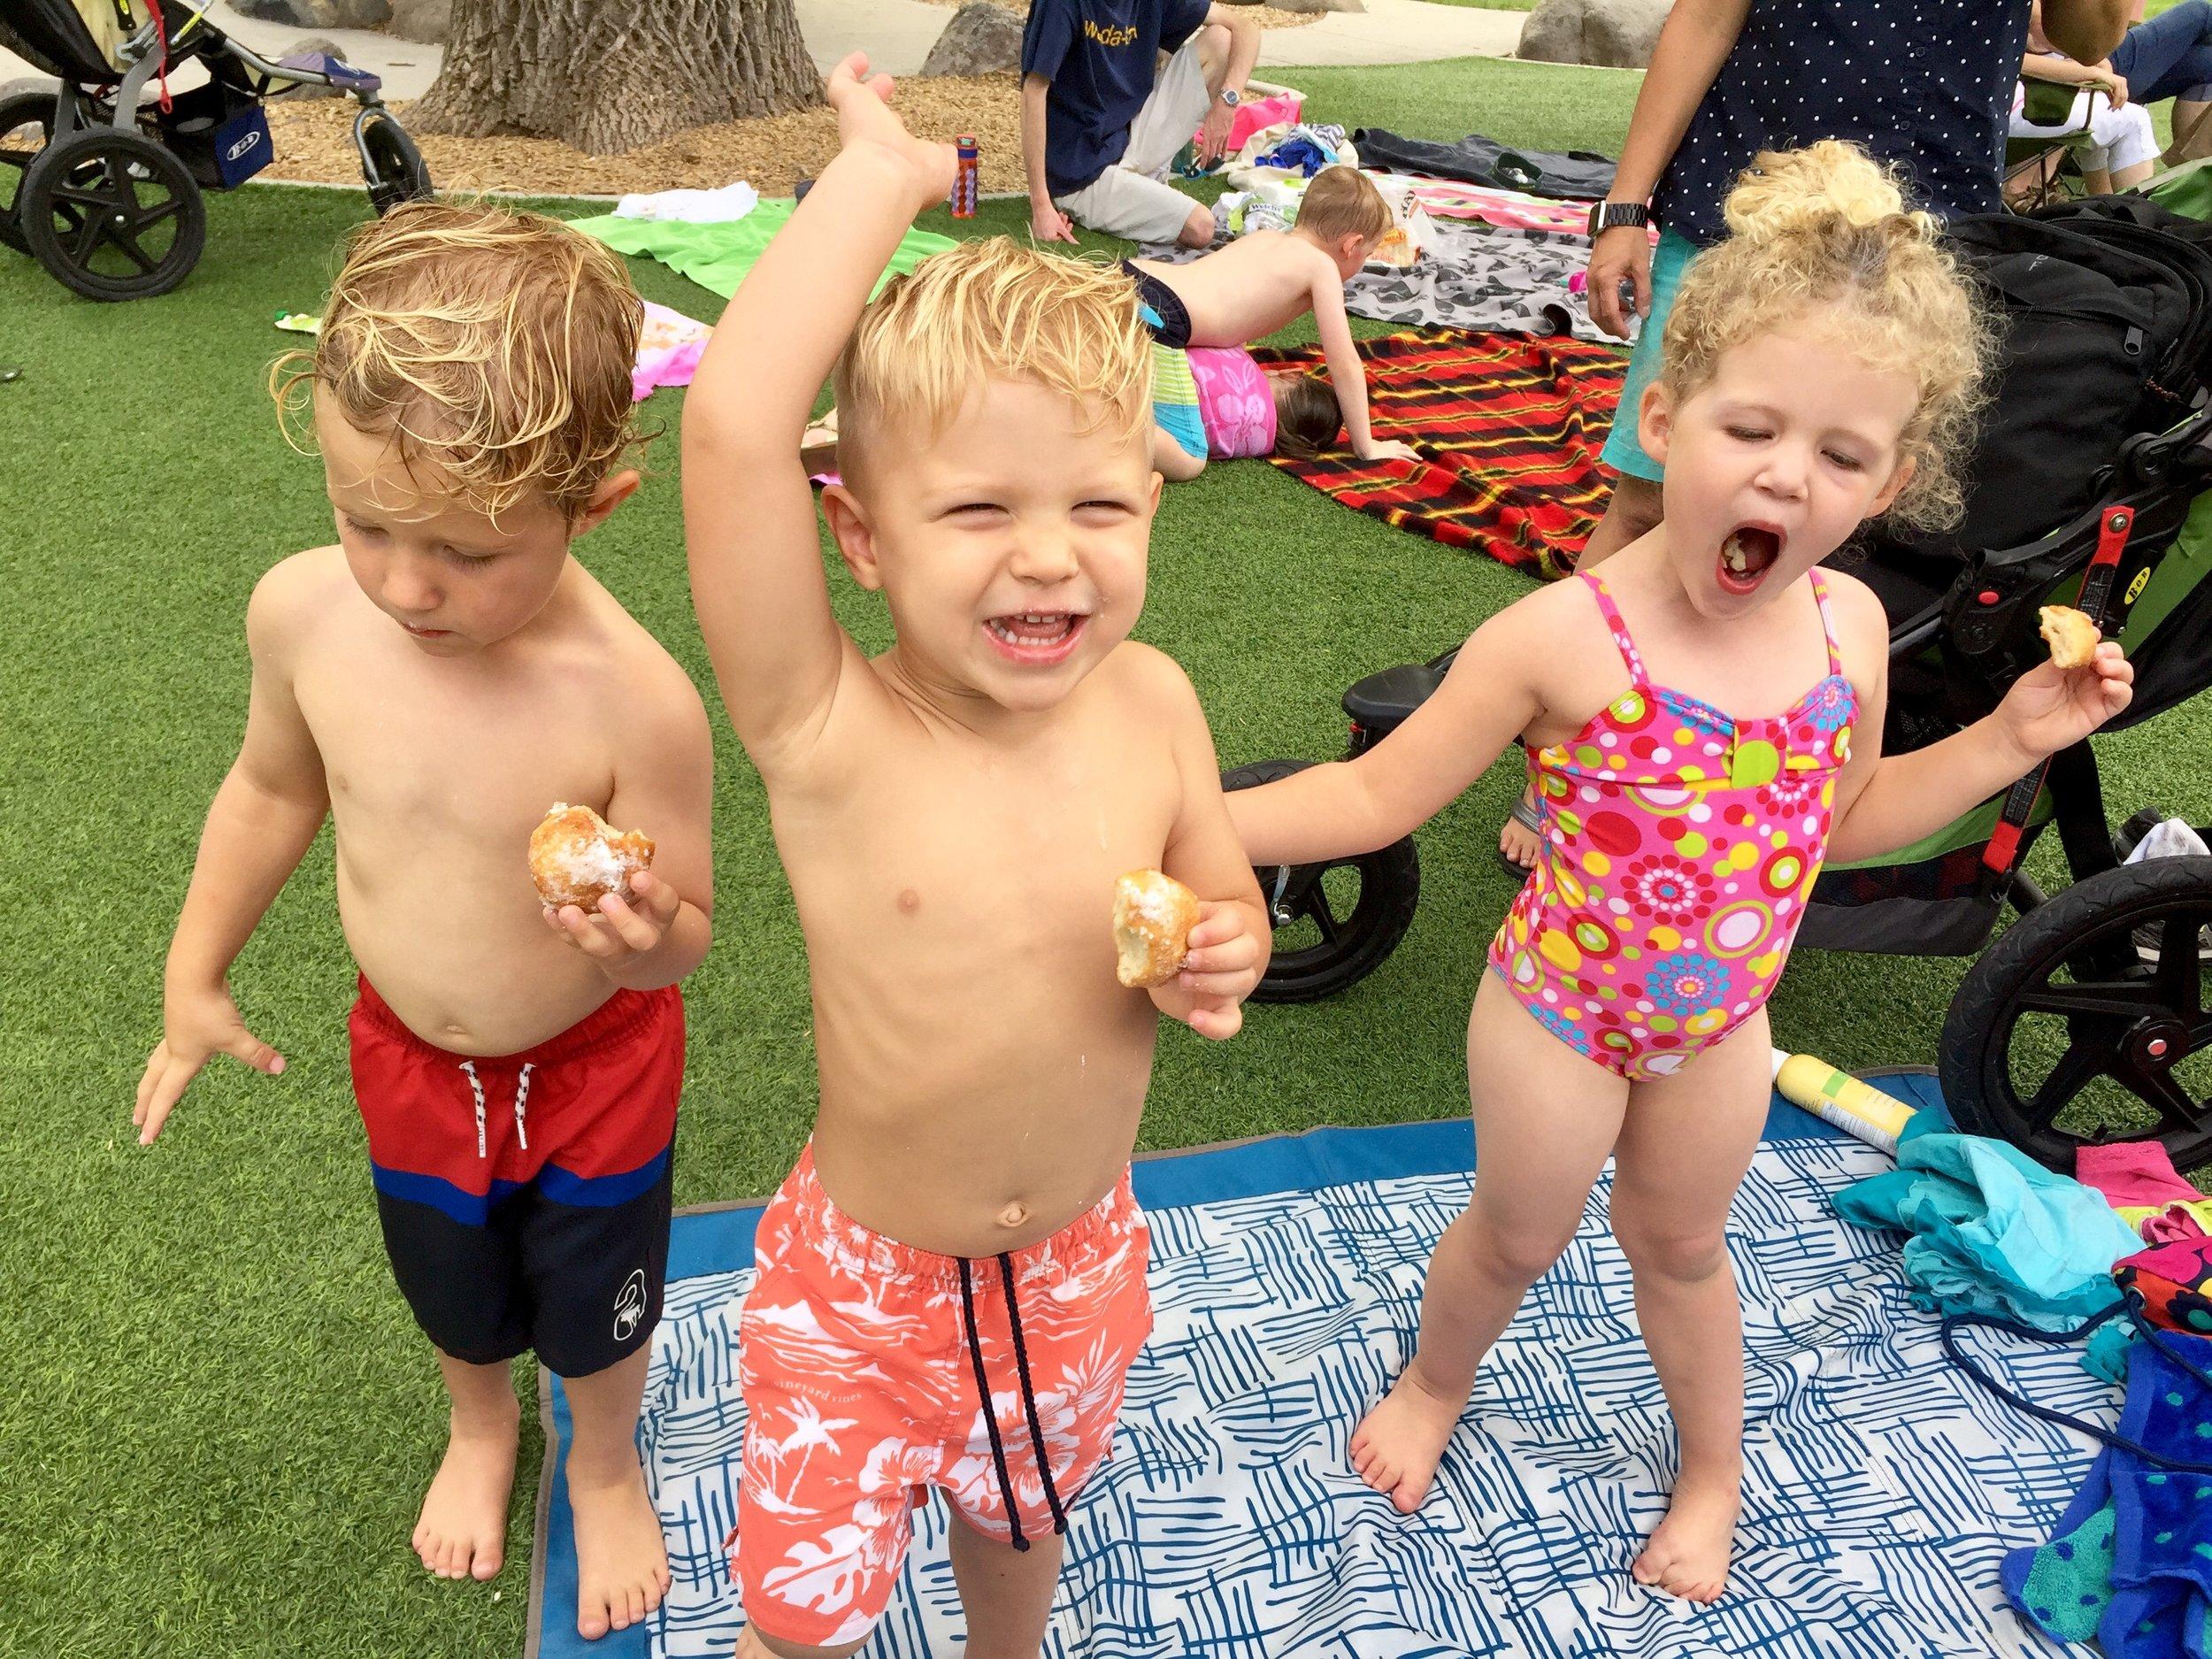 Cooling down at the Liberty Park Splash Pad!